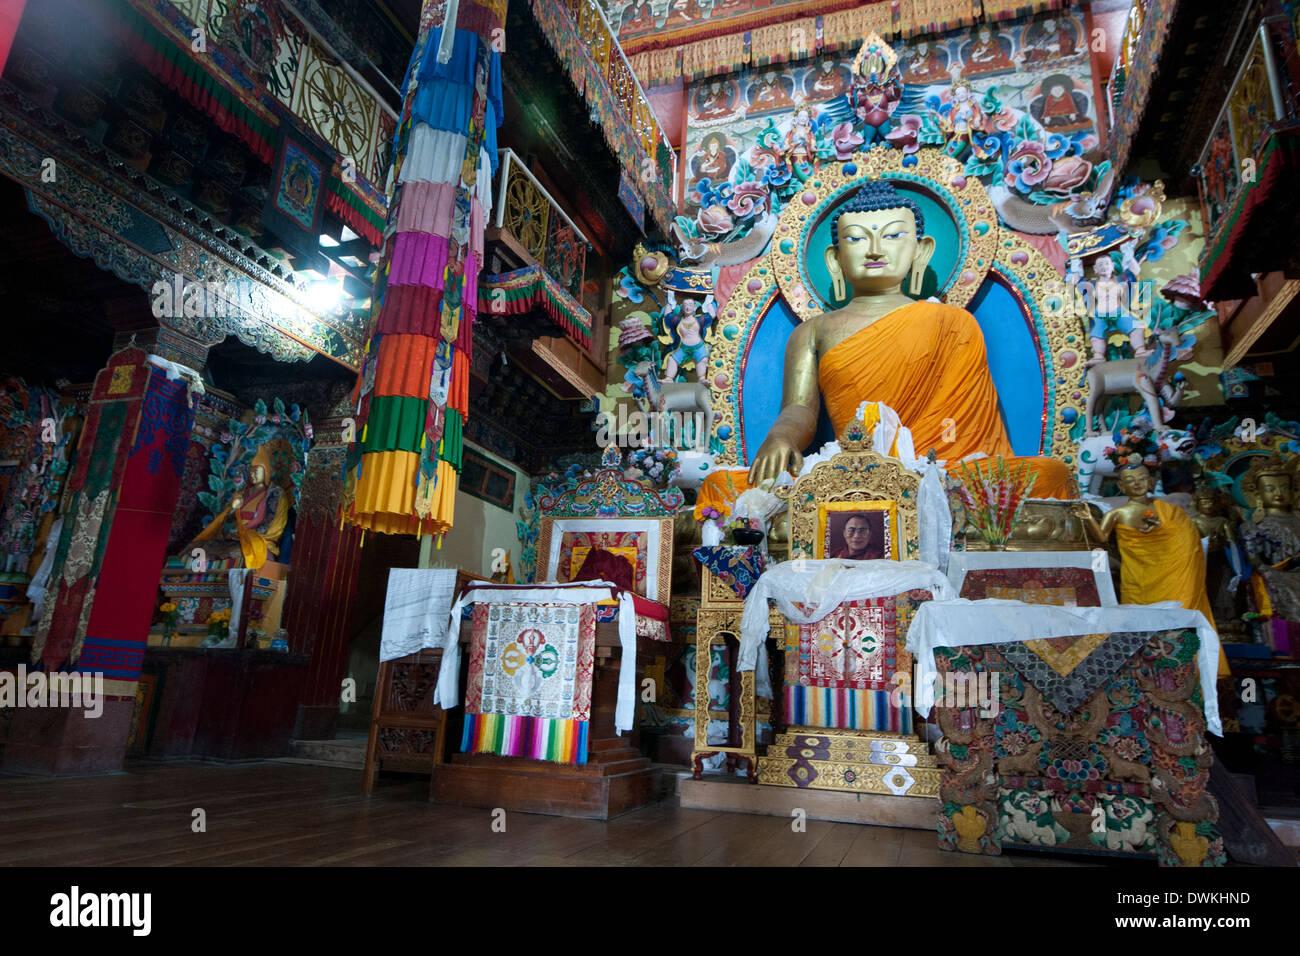 Large Buddha shrine in prayer hall, with photograph of the Dalai Llama, Tawang monastery, Arunachal Pradesh, India, Asia - Stock Image